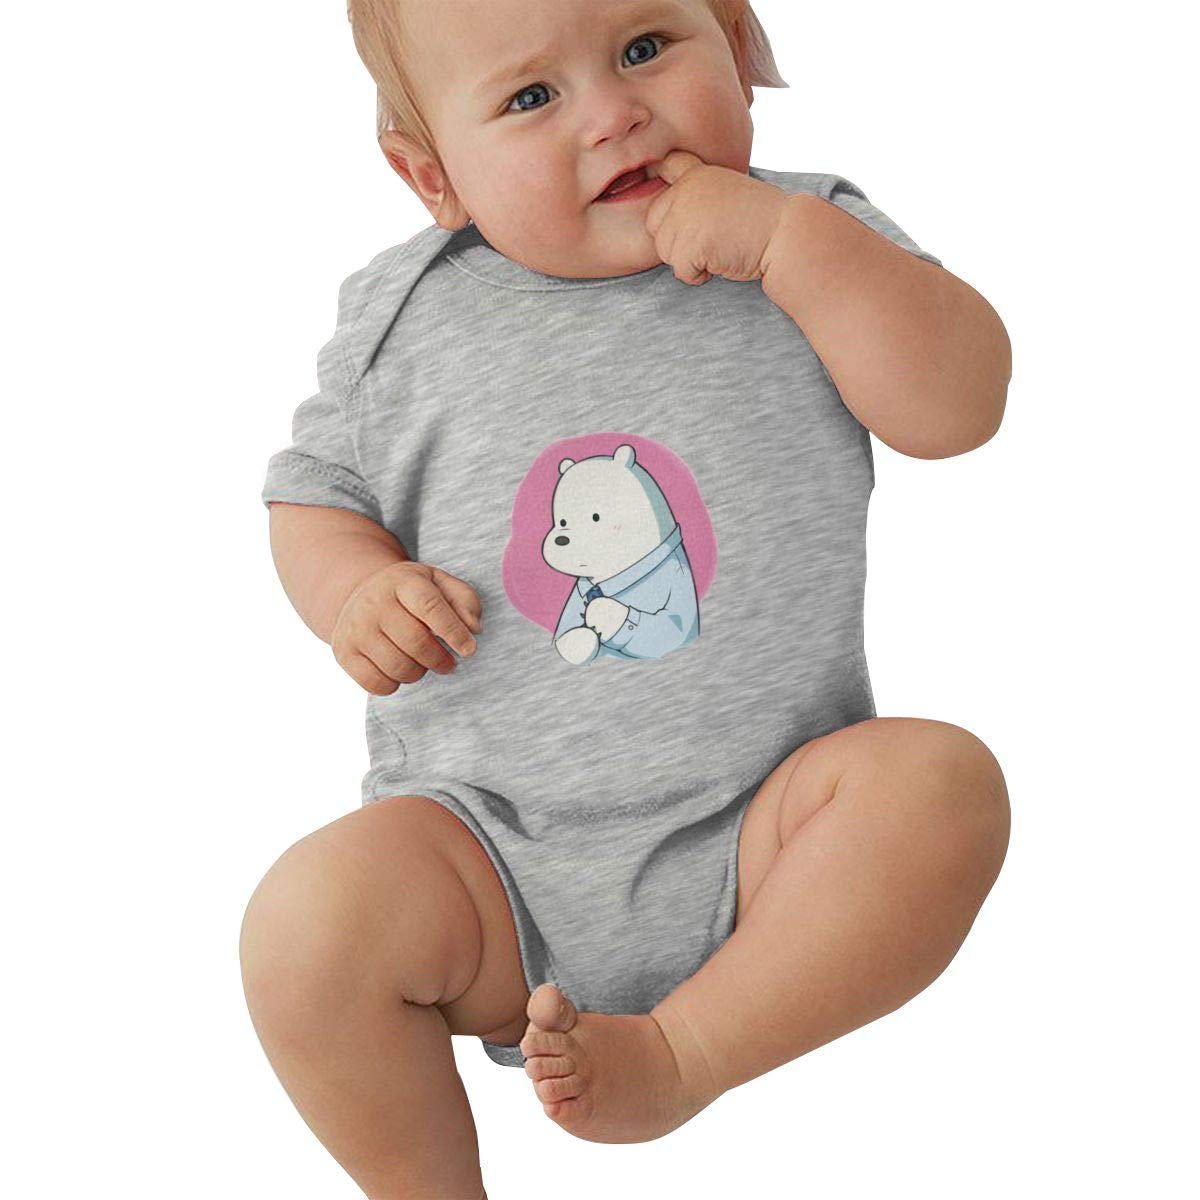 KunYuHeng Unisex Baby Round Neck Short-Sleeve Romper We Bare Bears Funny Jumpsuits Sleepwear Black